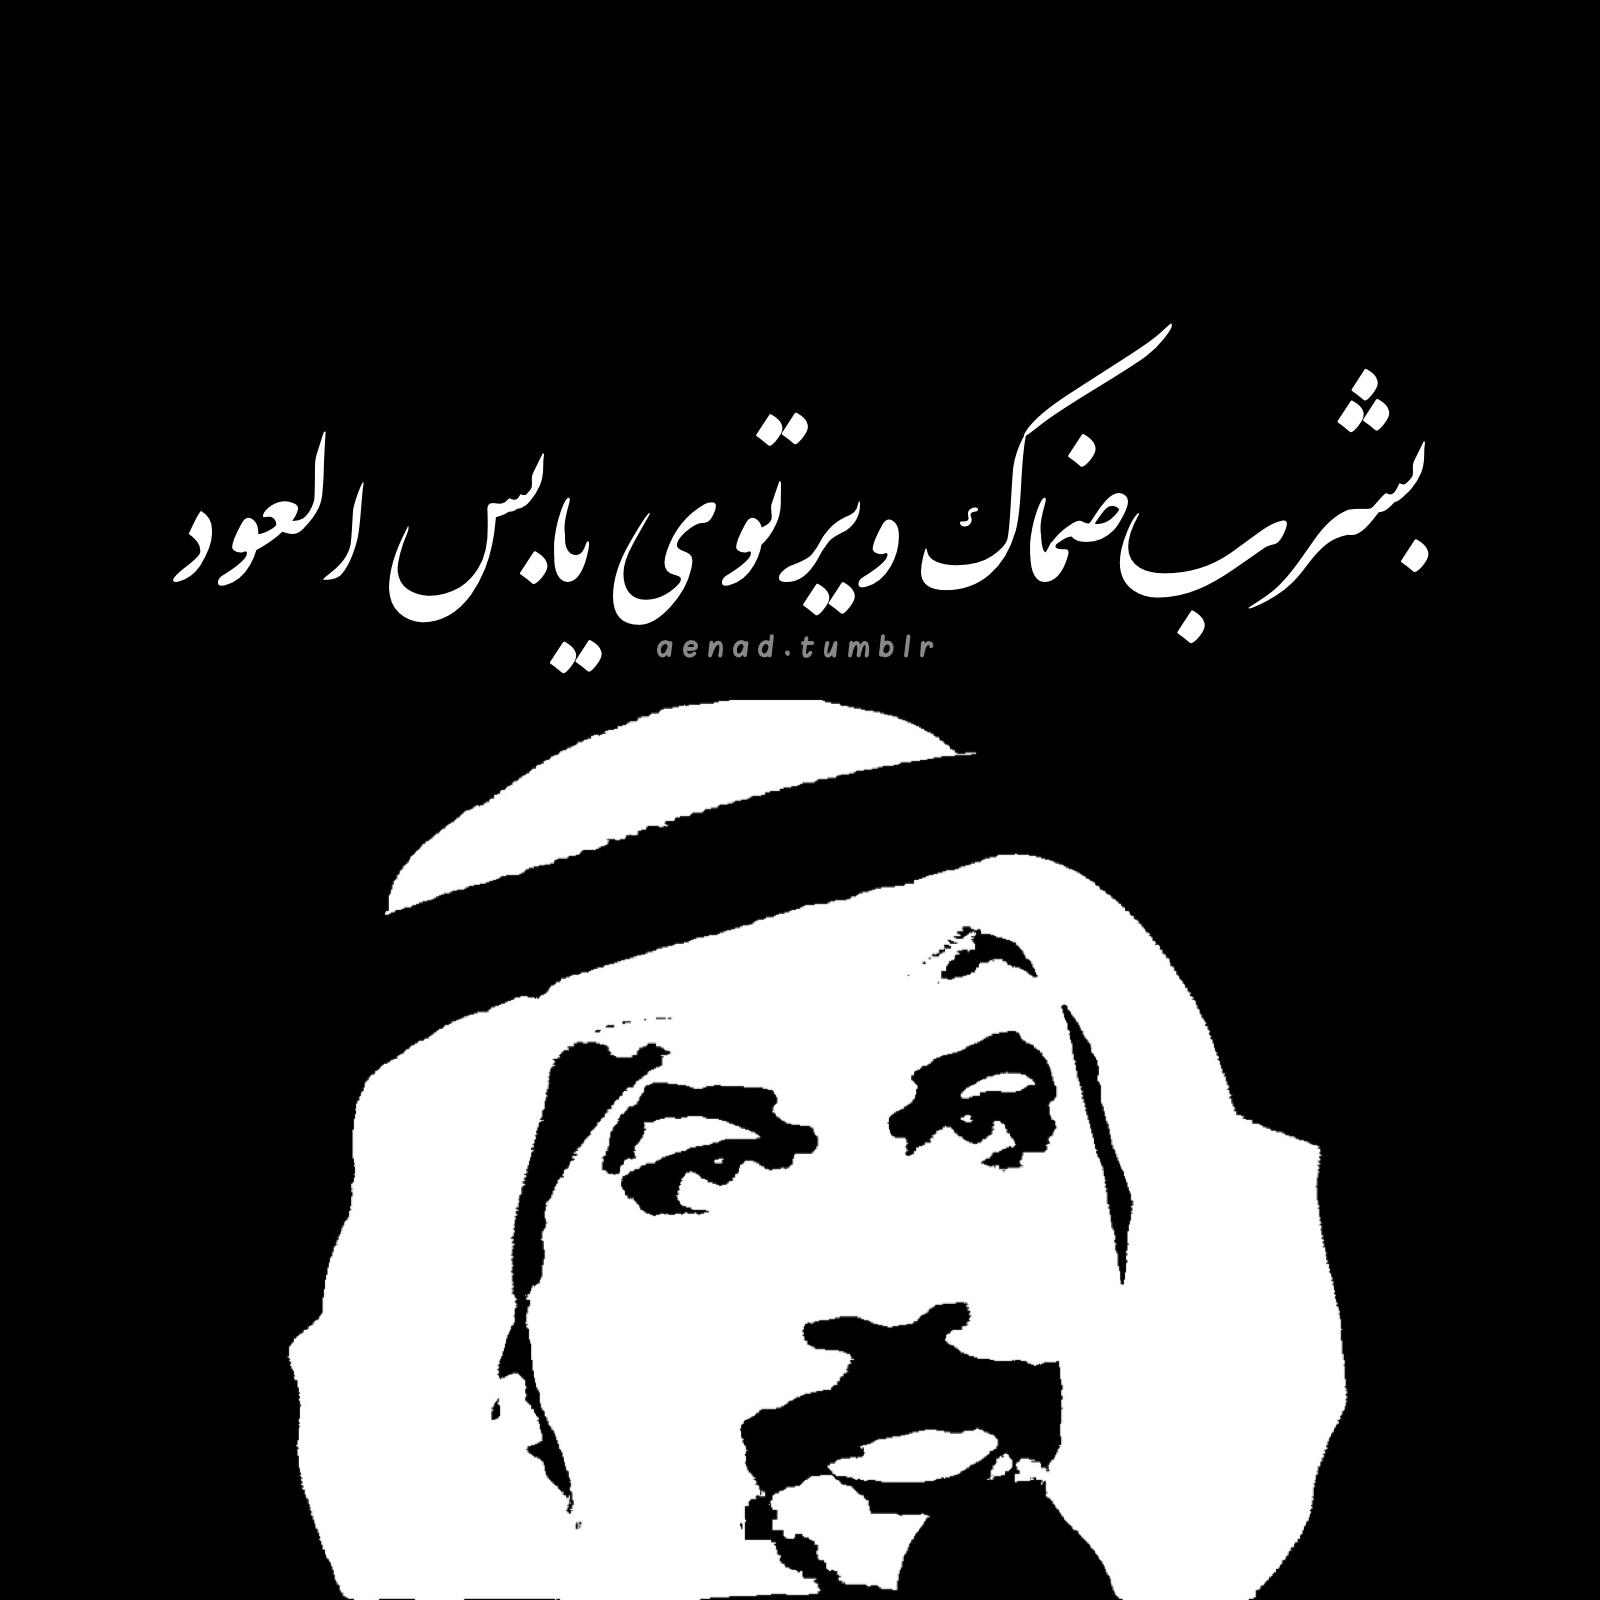 Pin By عناد ديزاينر On عبادي الجوهر عباديات جوهريات Arabic Art Music Stickers Heart Box Template